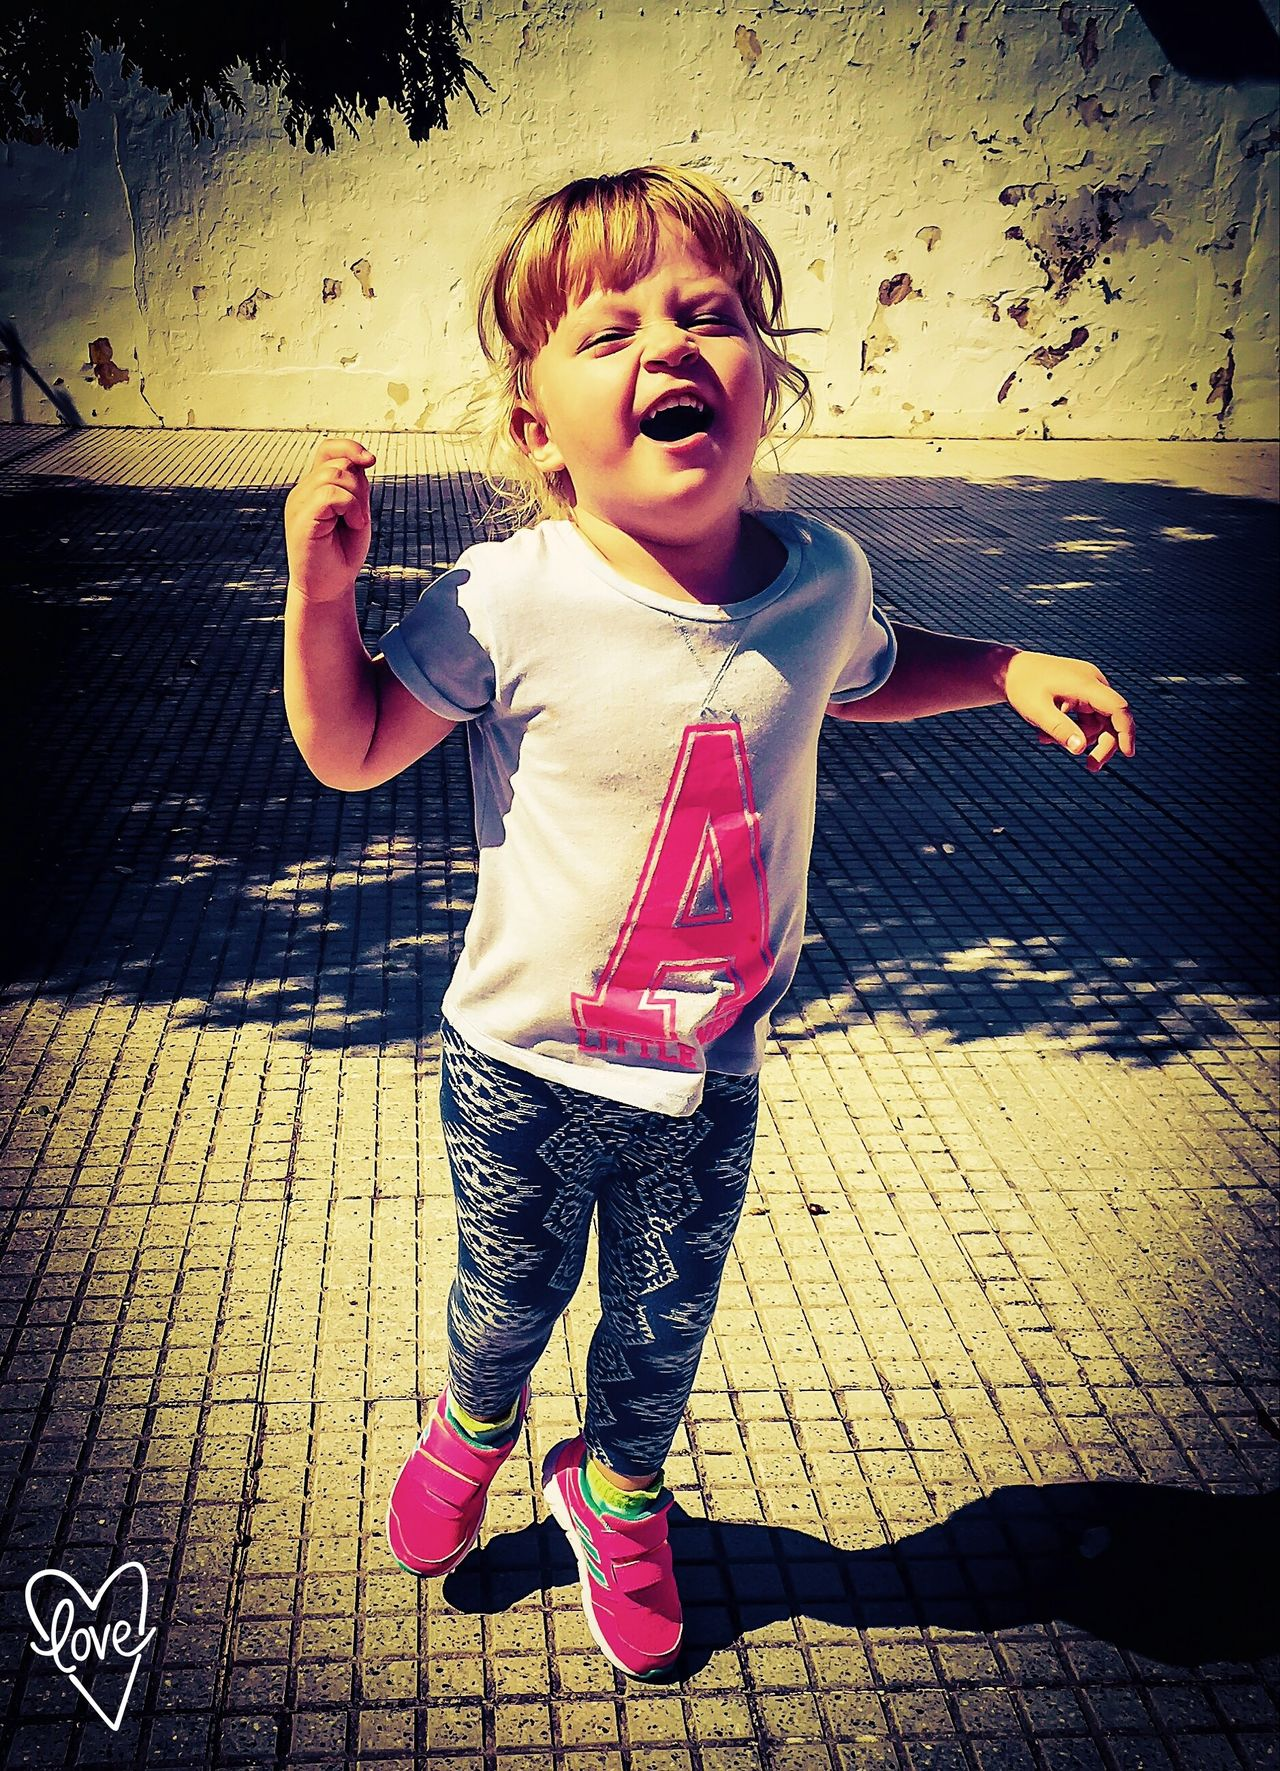 Niñas Nina Calle Callejeando Divercion Alegría Alegria♥♥♥